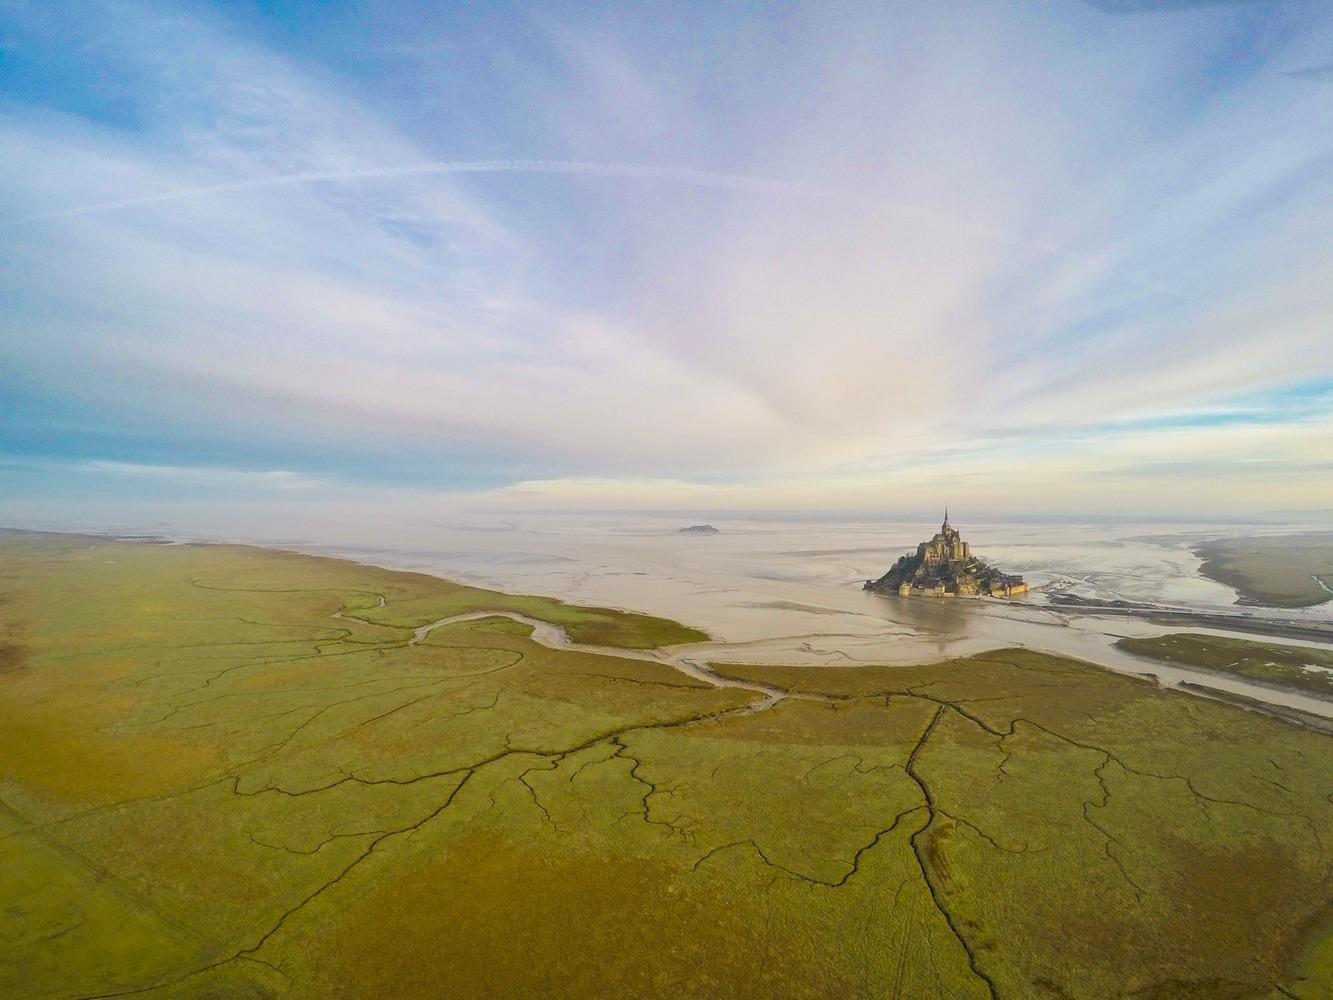 Mont Saint-Michel (Muntele Sfântul Mihail), Normandia, Franța. Foto: Jeremie Eloy / Dronestagram